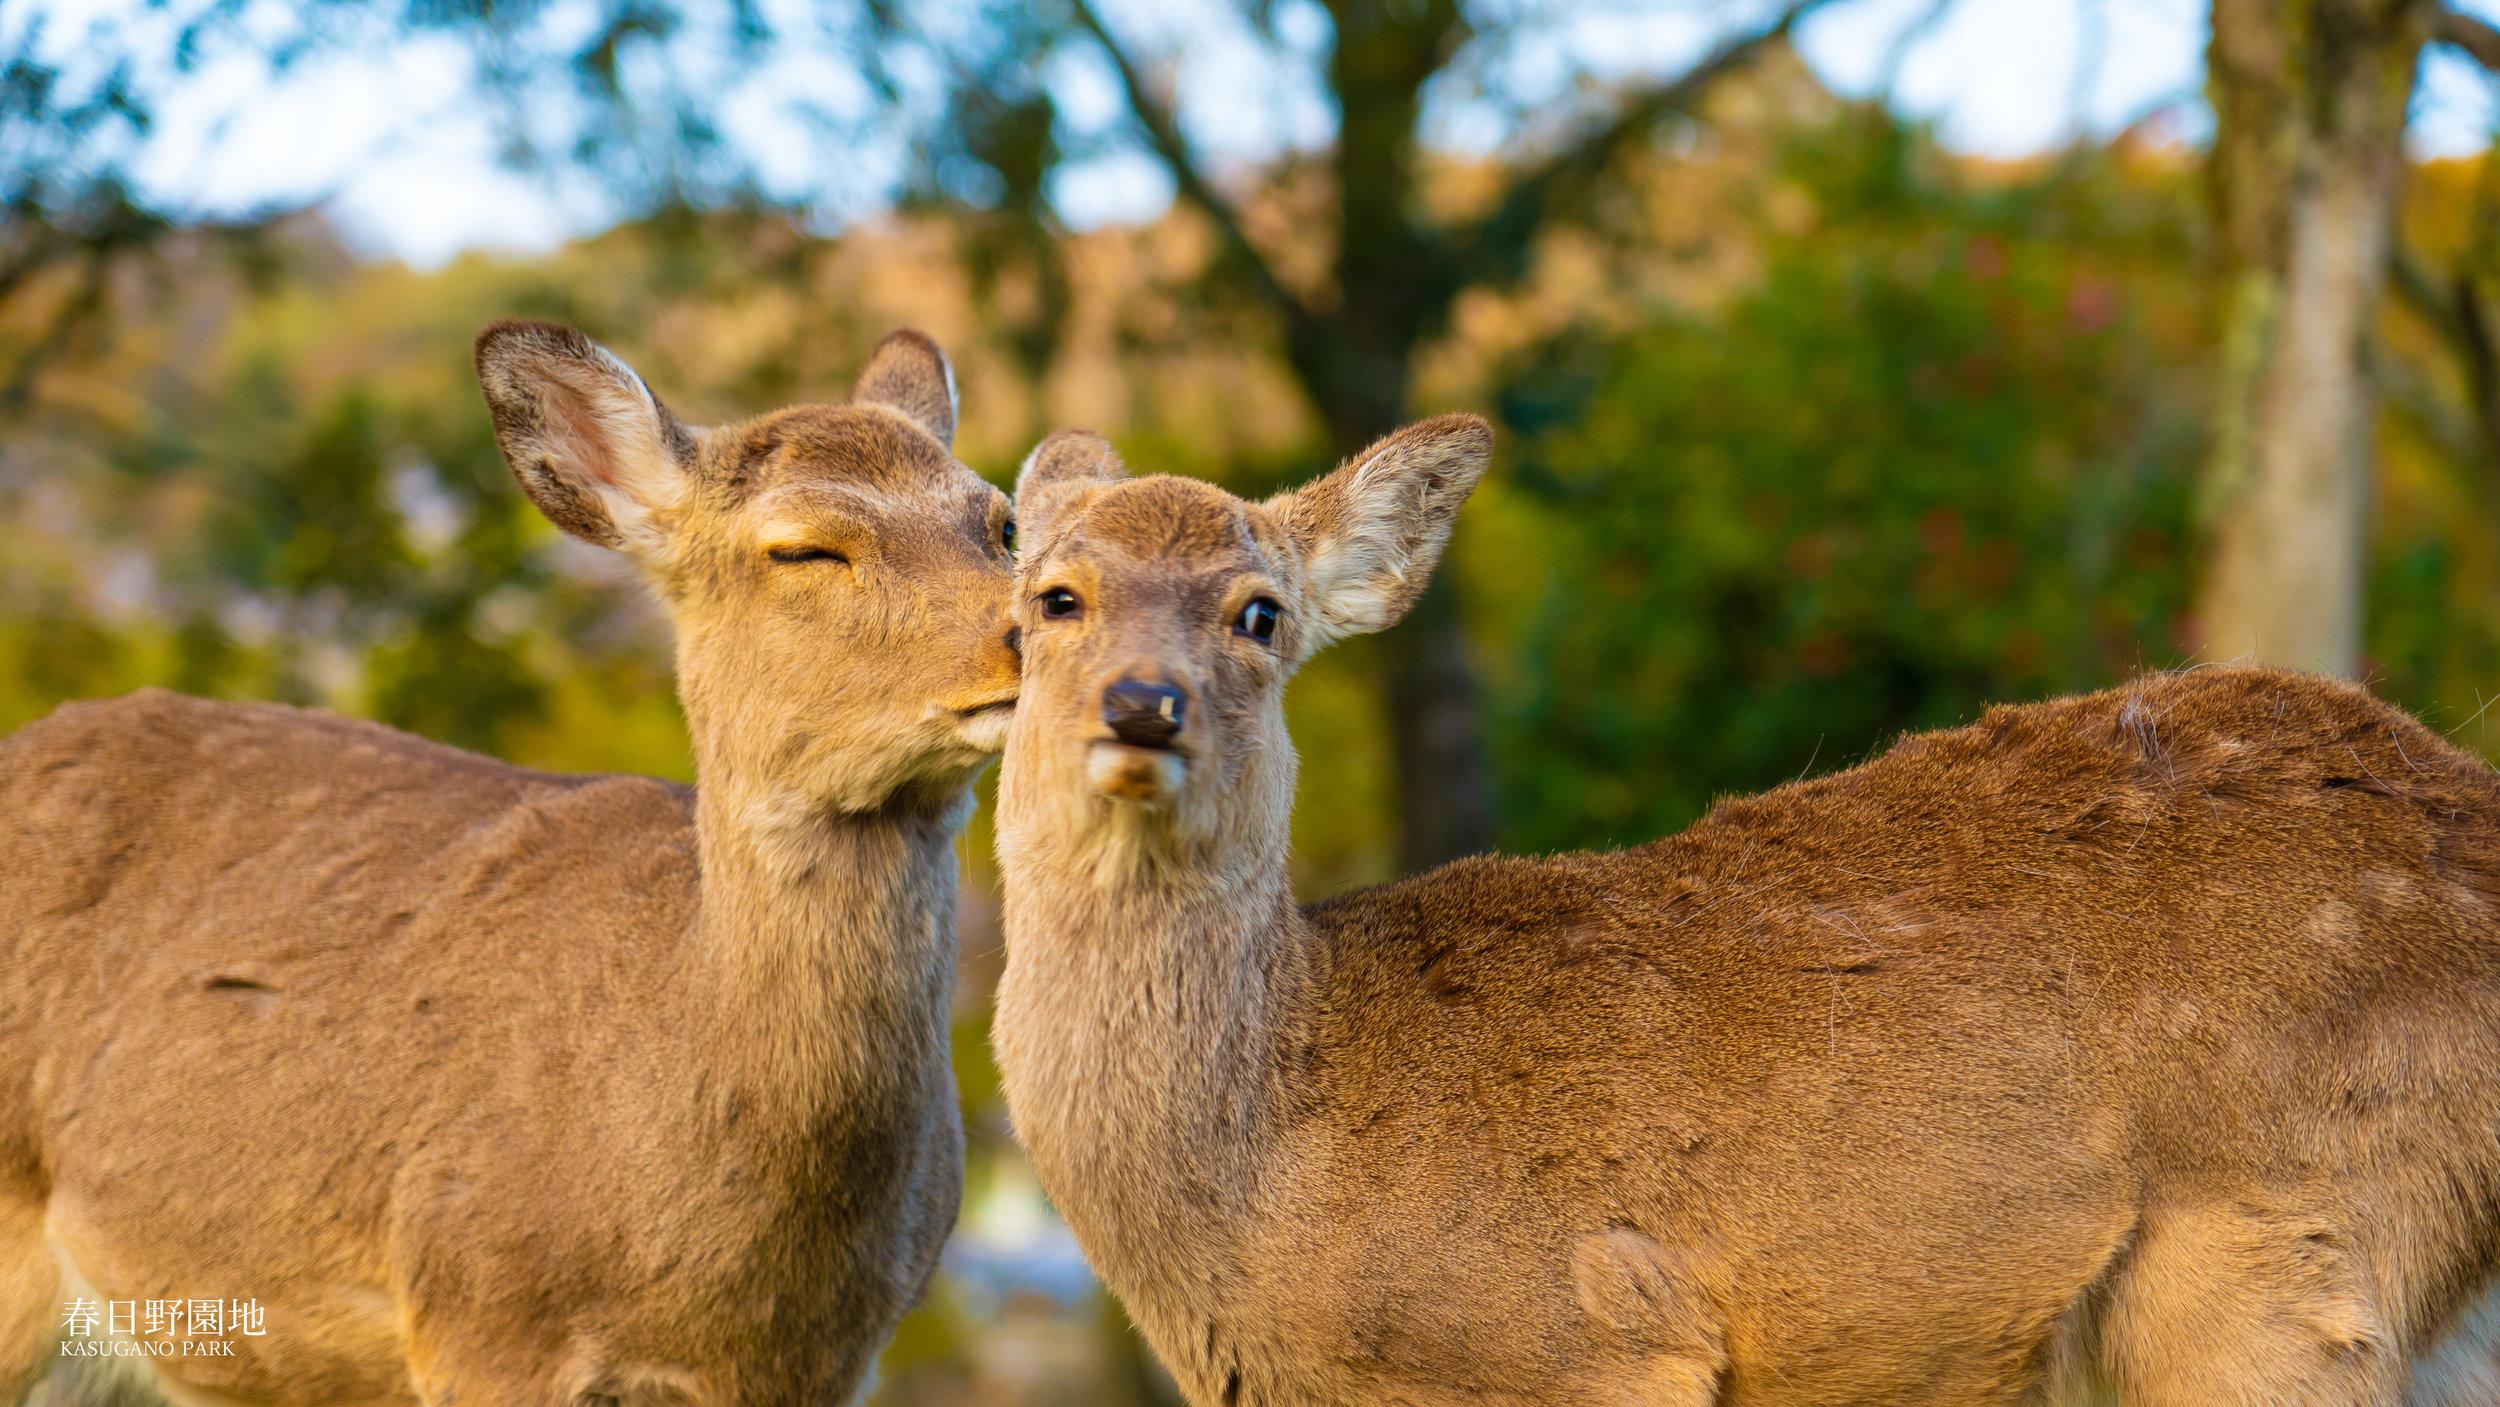 The Park of Deers